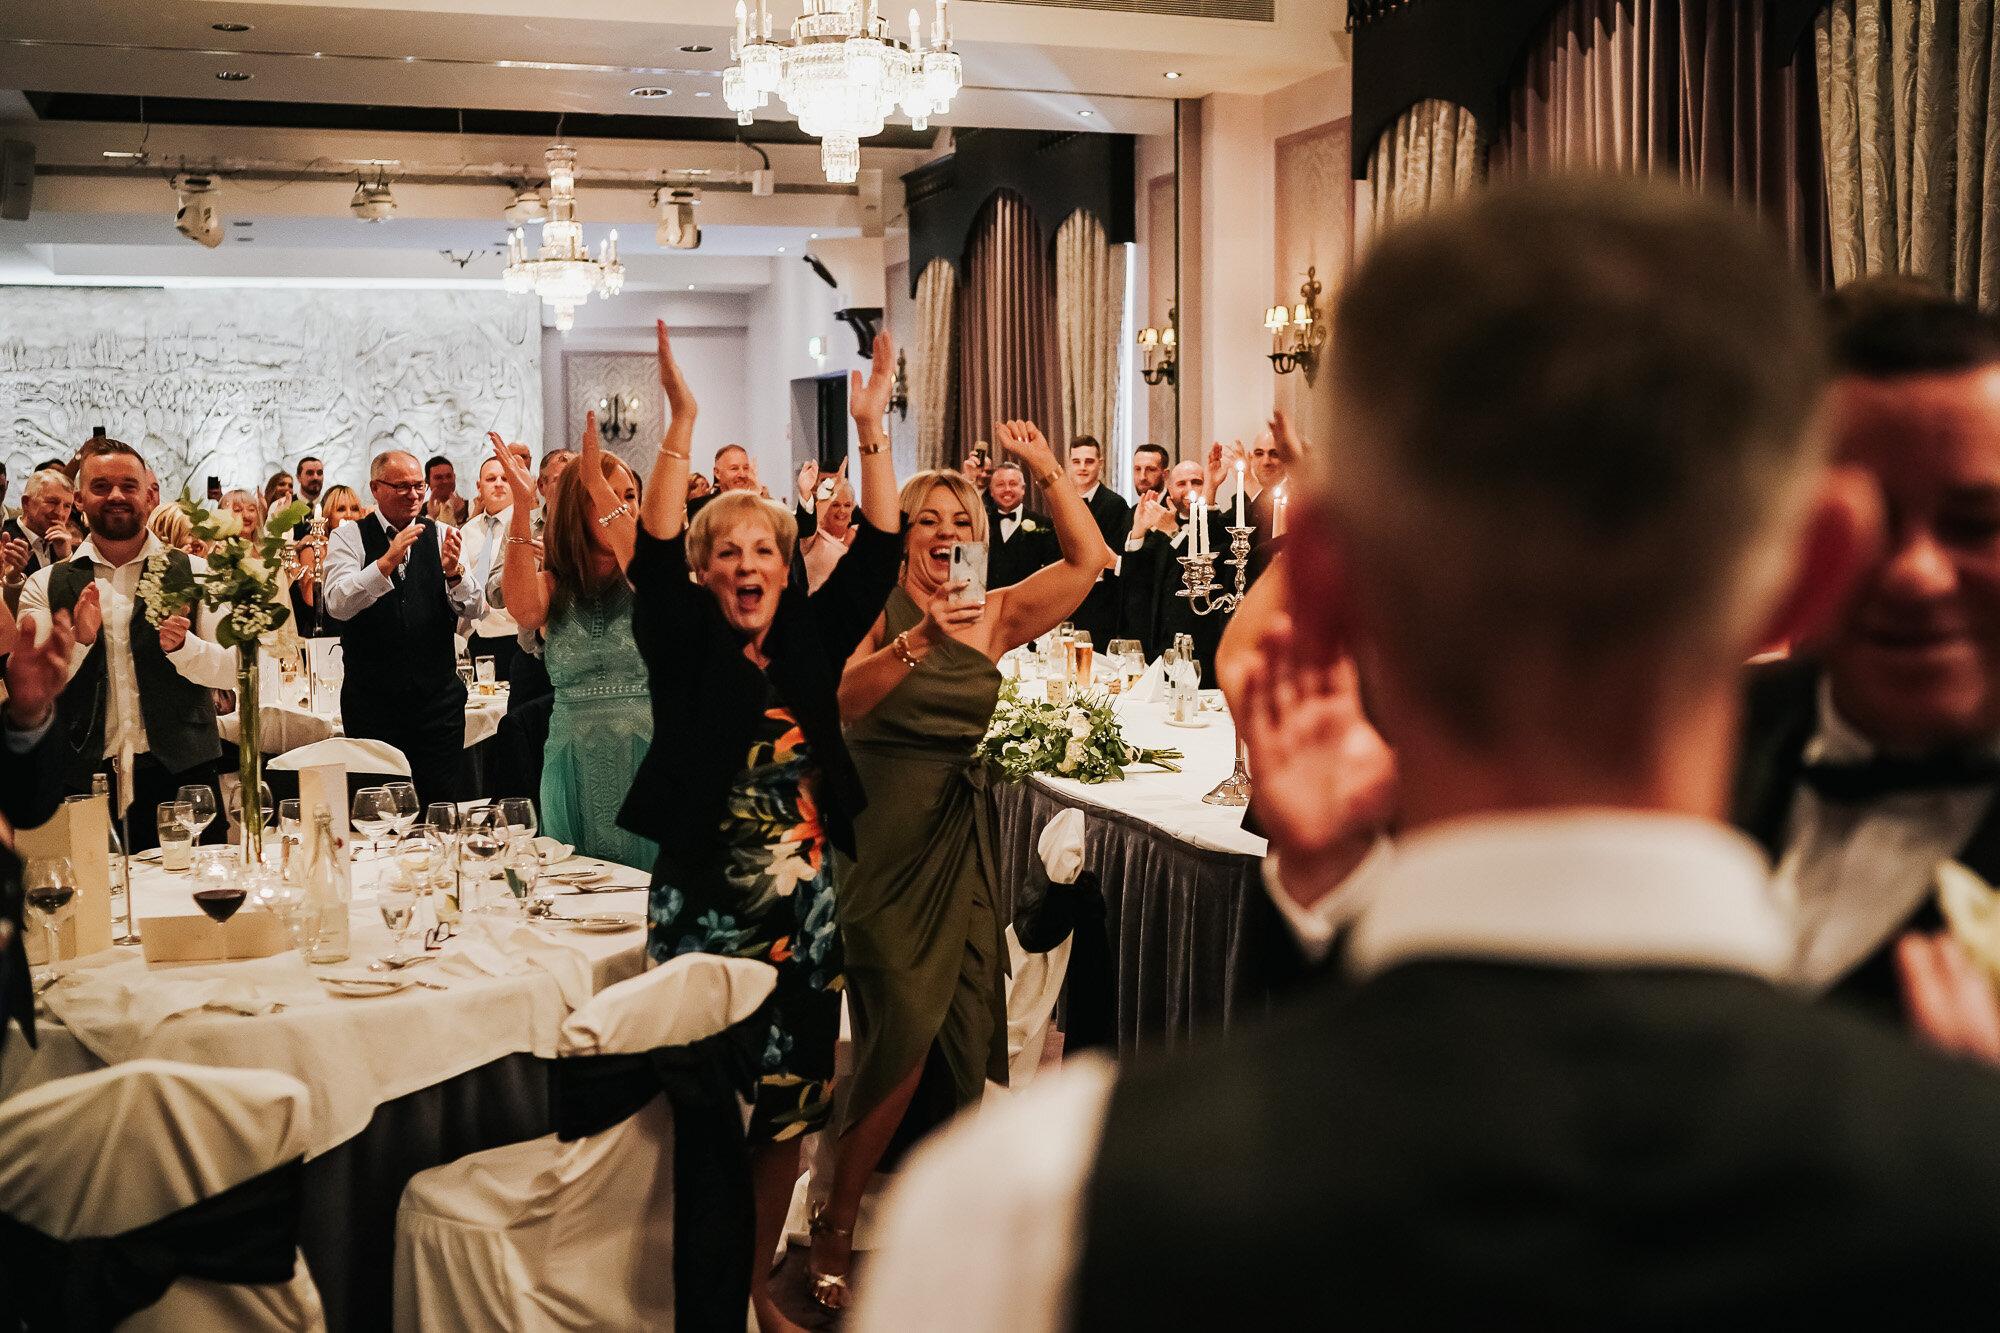 Clontarf Caste wedding photographer Wedding Photography dublin ireland wedding photographer (44 of 58).jpg